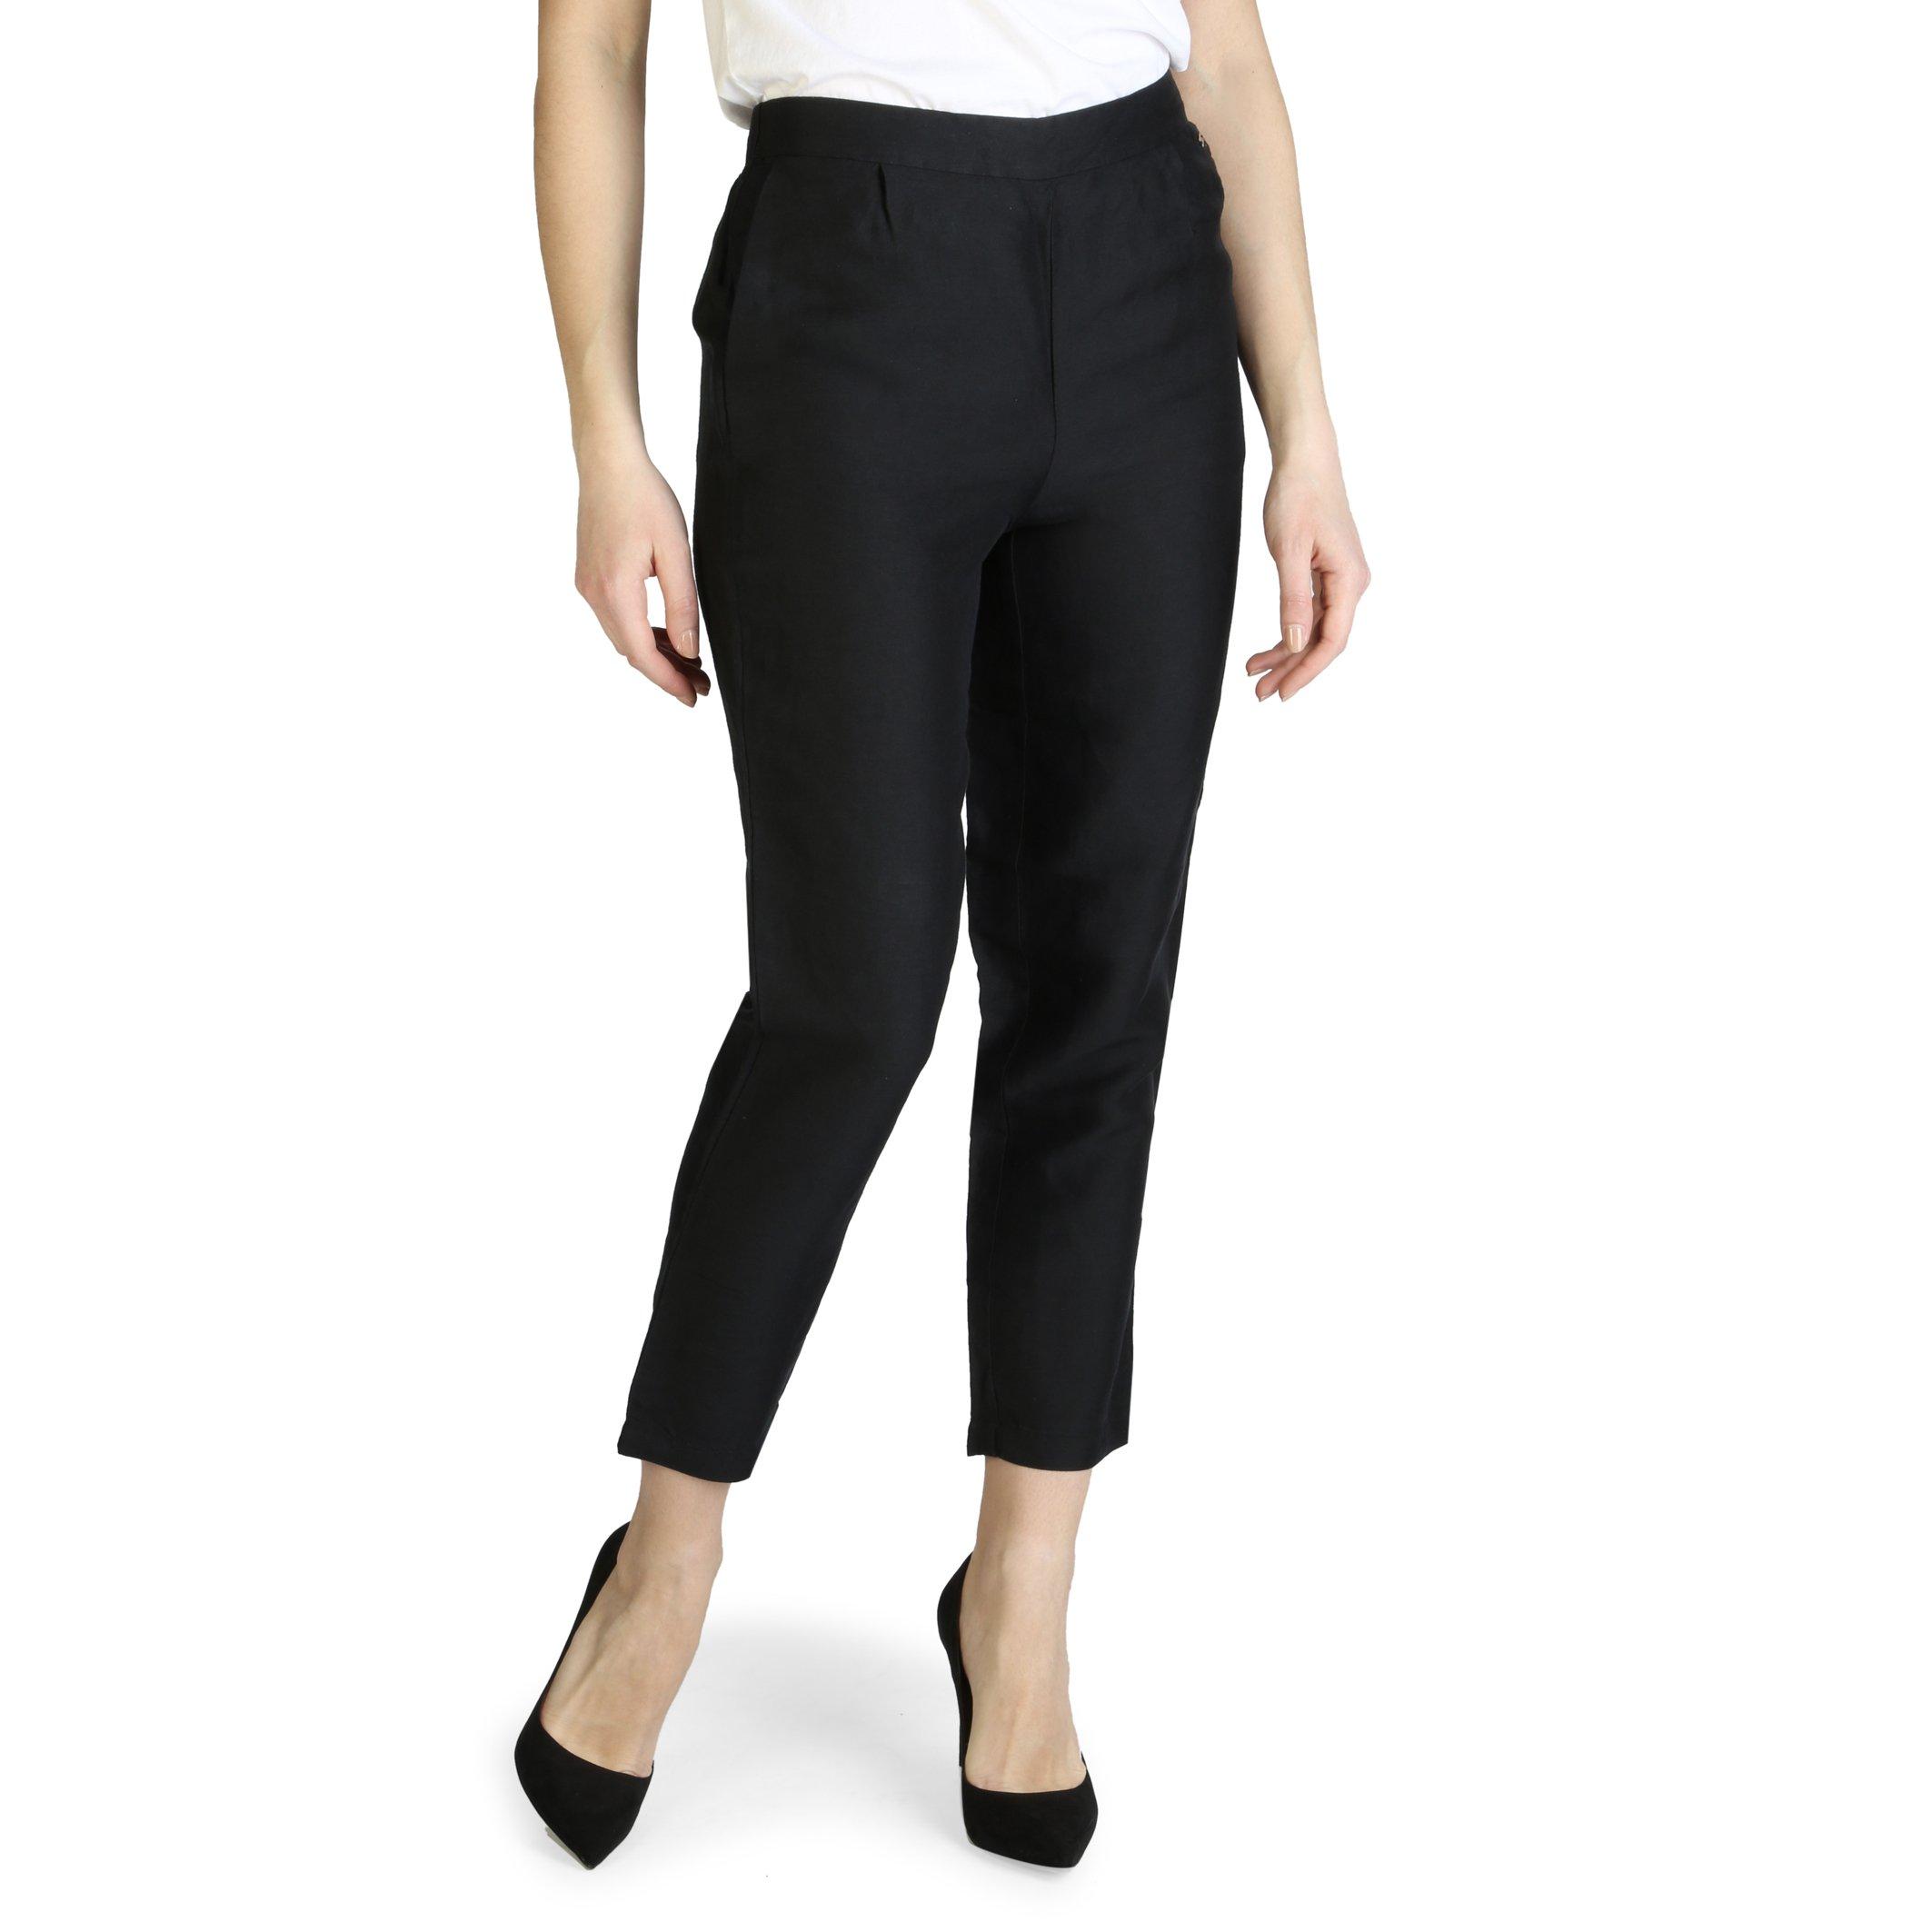 Armani Exchange Women's Trouser Various Colours 3ZYP19_YNBBZ - black 2